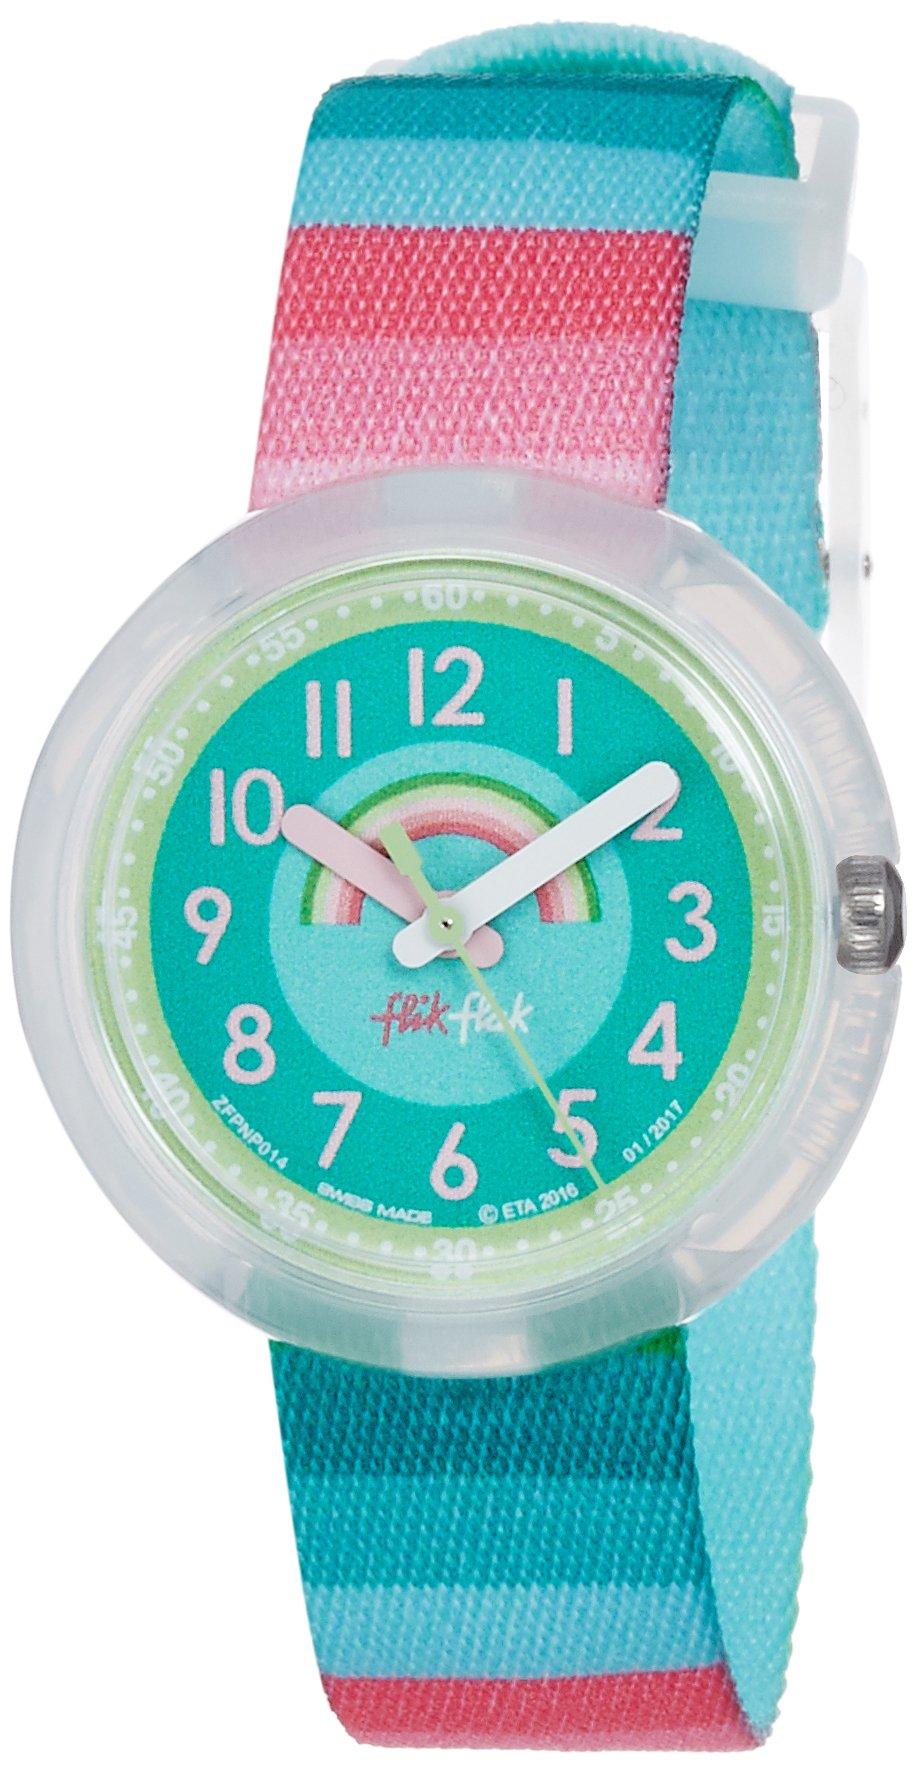 Flik Flak Kids' Quartz Nylon Strap, Green, 14 Casual Watch (Model: ZFPNP014) by Flik Flak